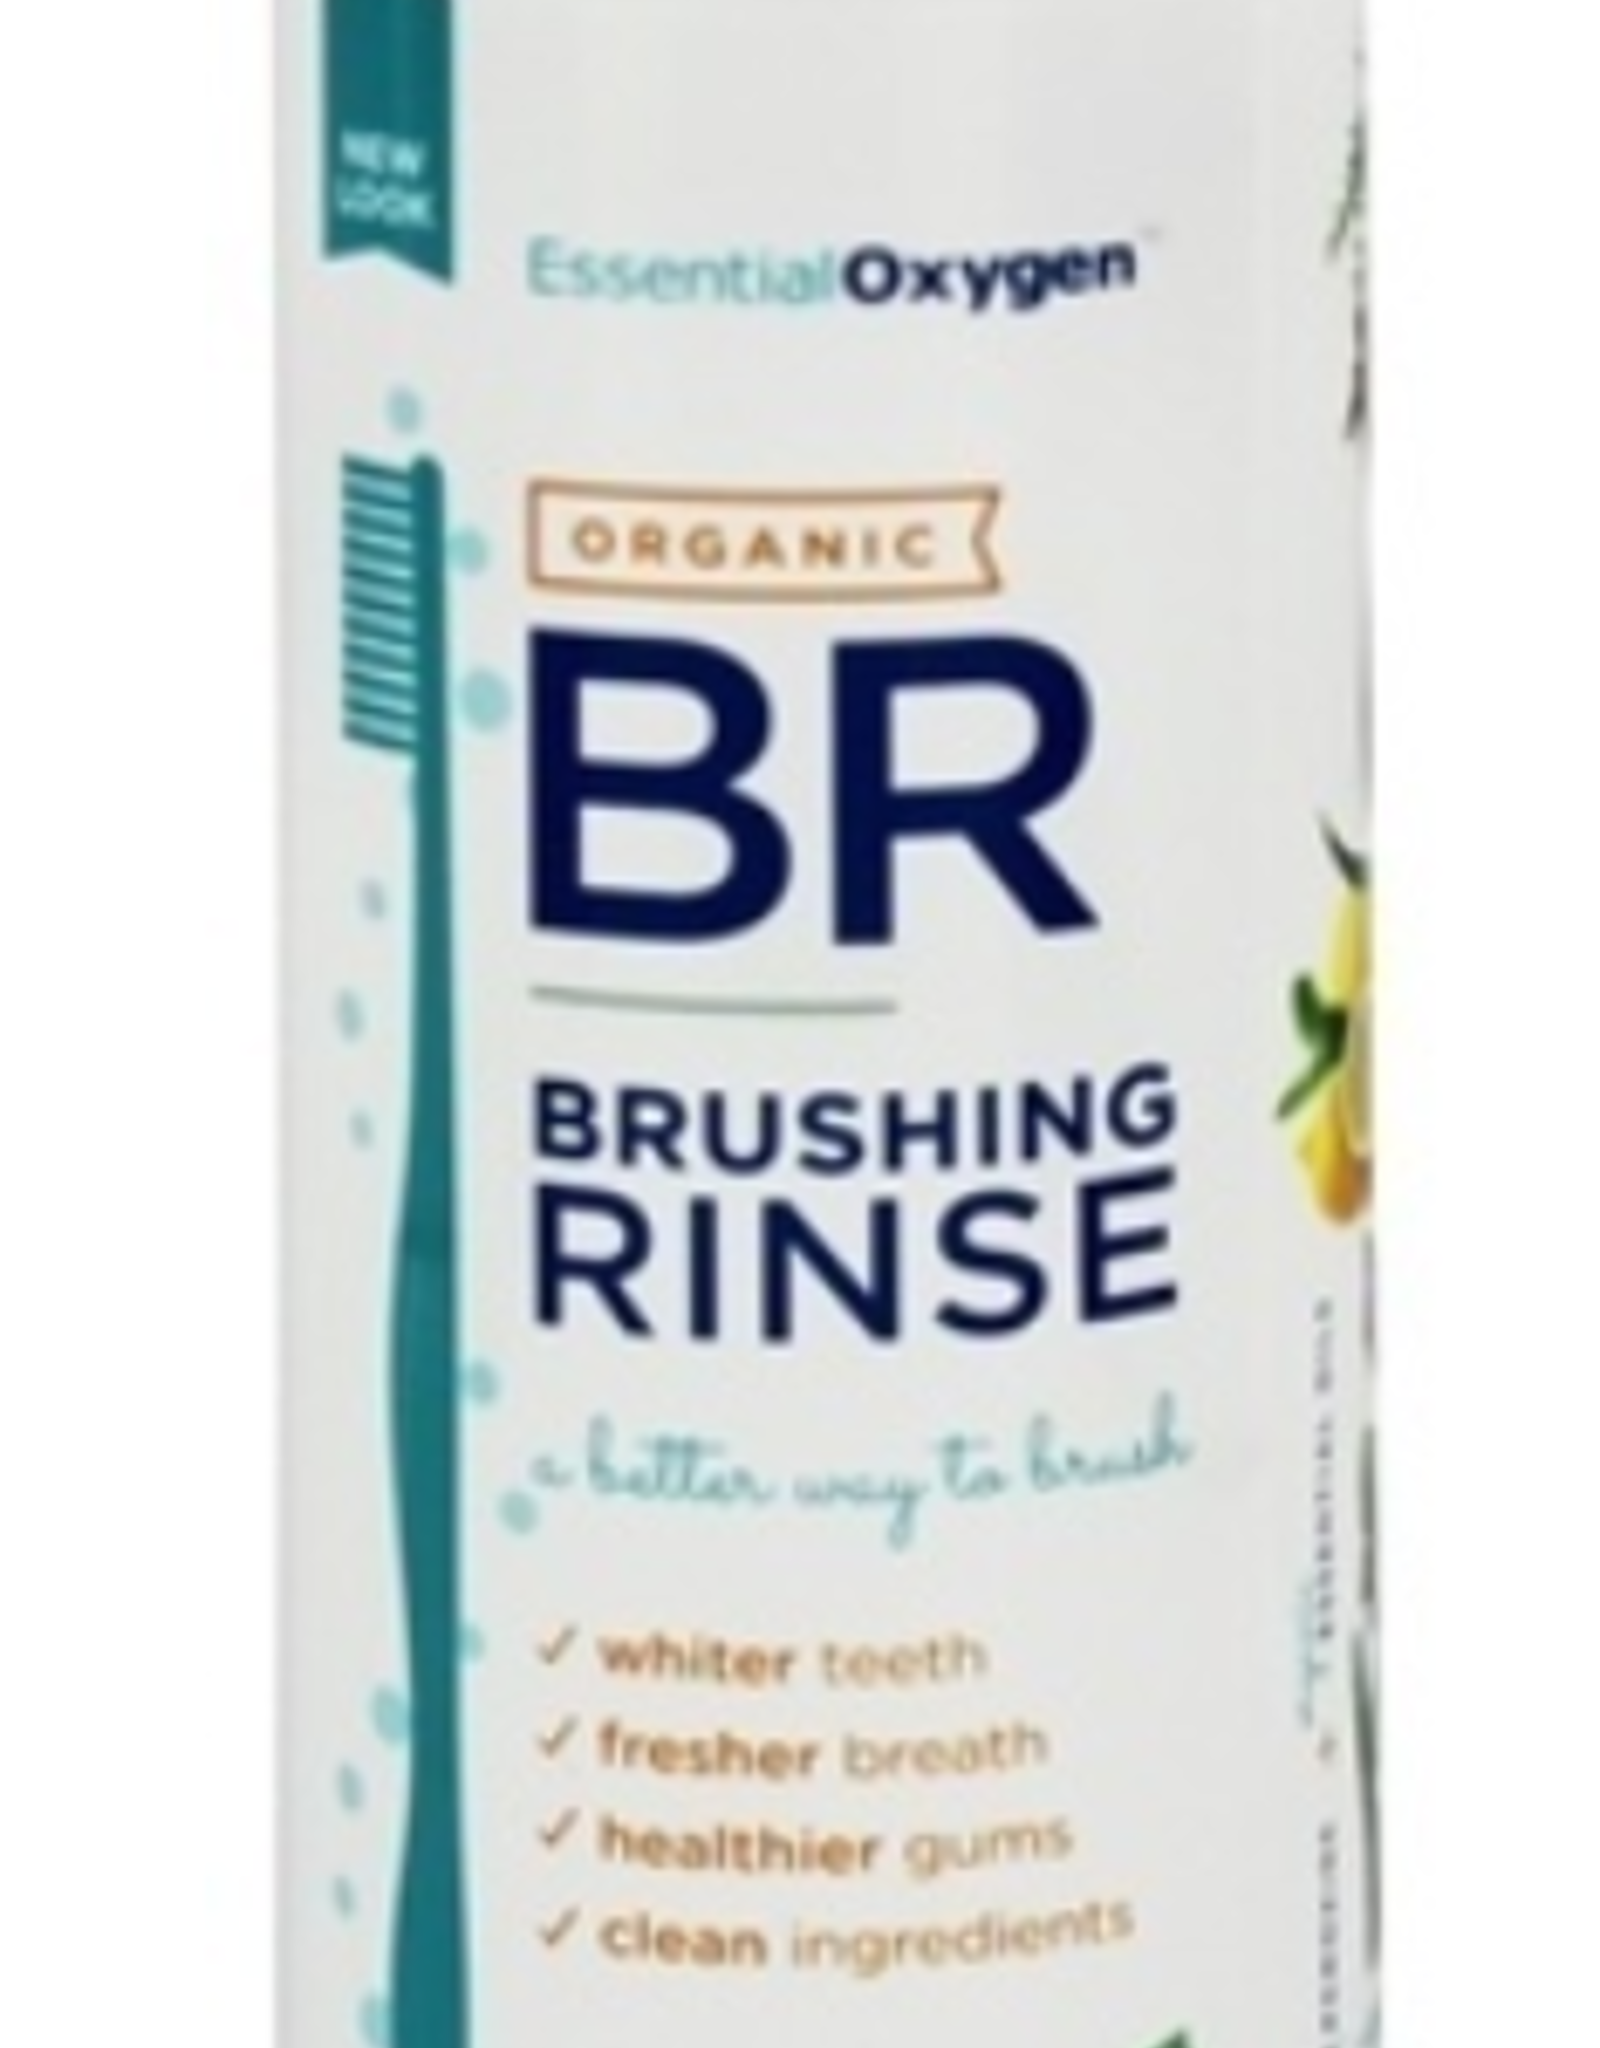 Essential Oxygen Essential Oxygen - Organic Brushing Rinse, Peppermint